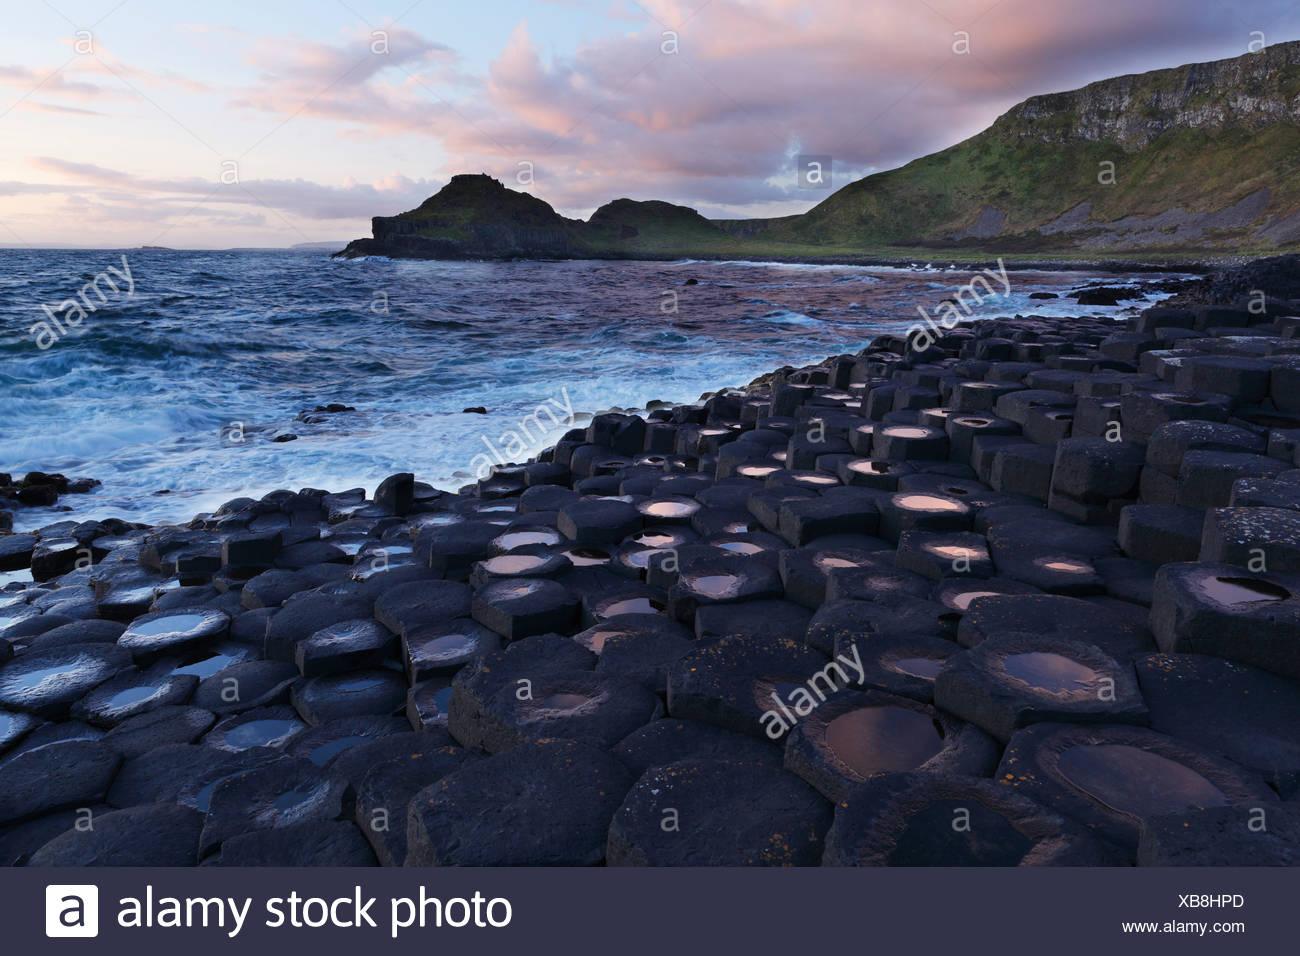 Basaltic columns, Giant's Causeway, Causeway Coast, County Antrim, Northern Ireland, United Kingdom, Europe - Stock Image